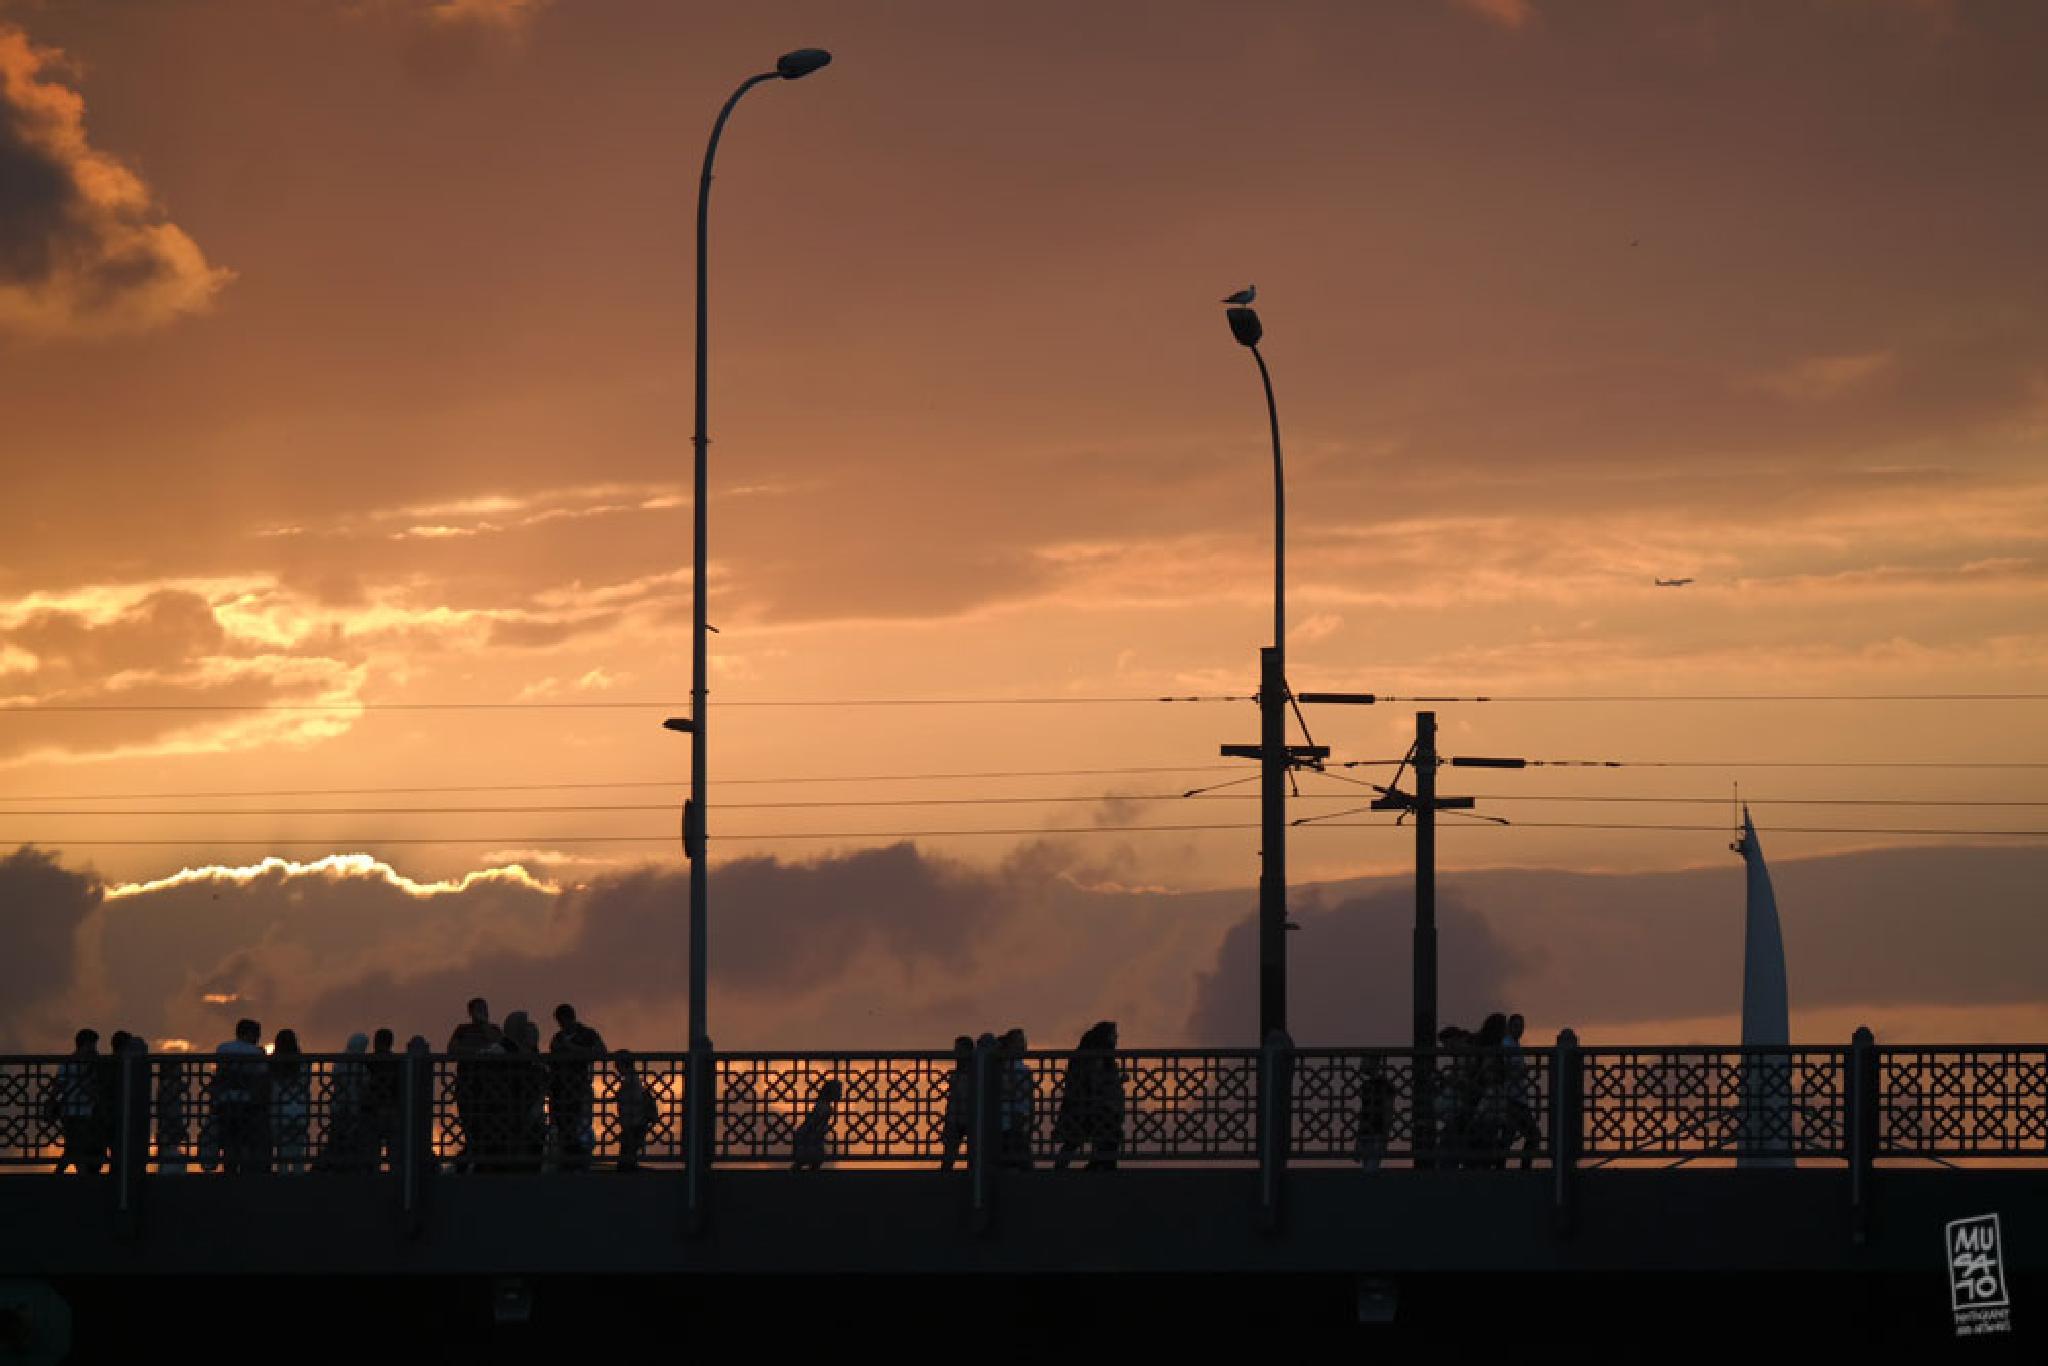 Bridge by Musato